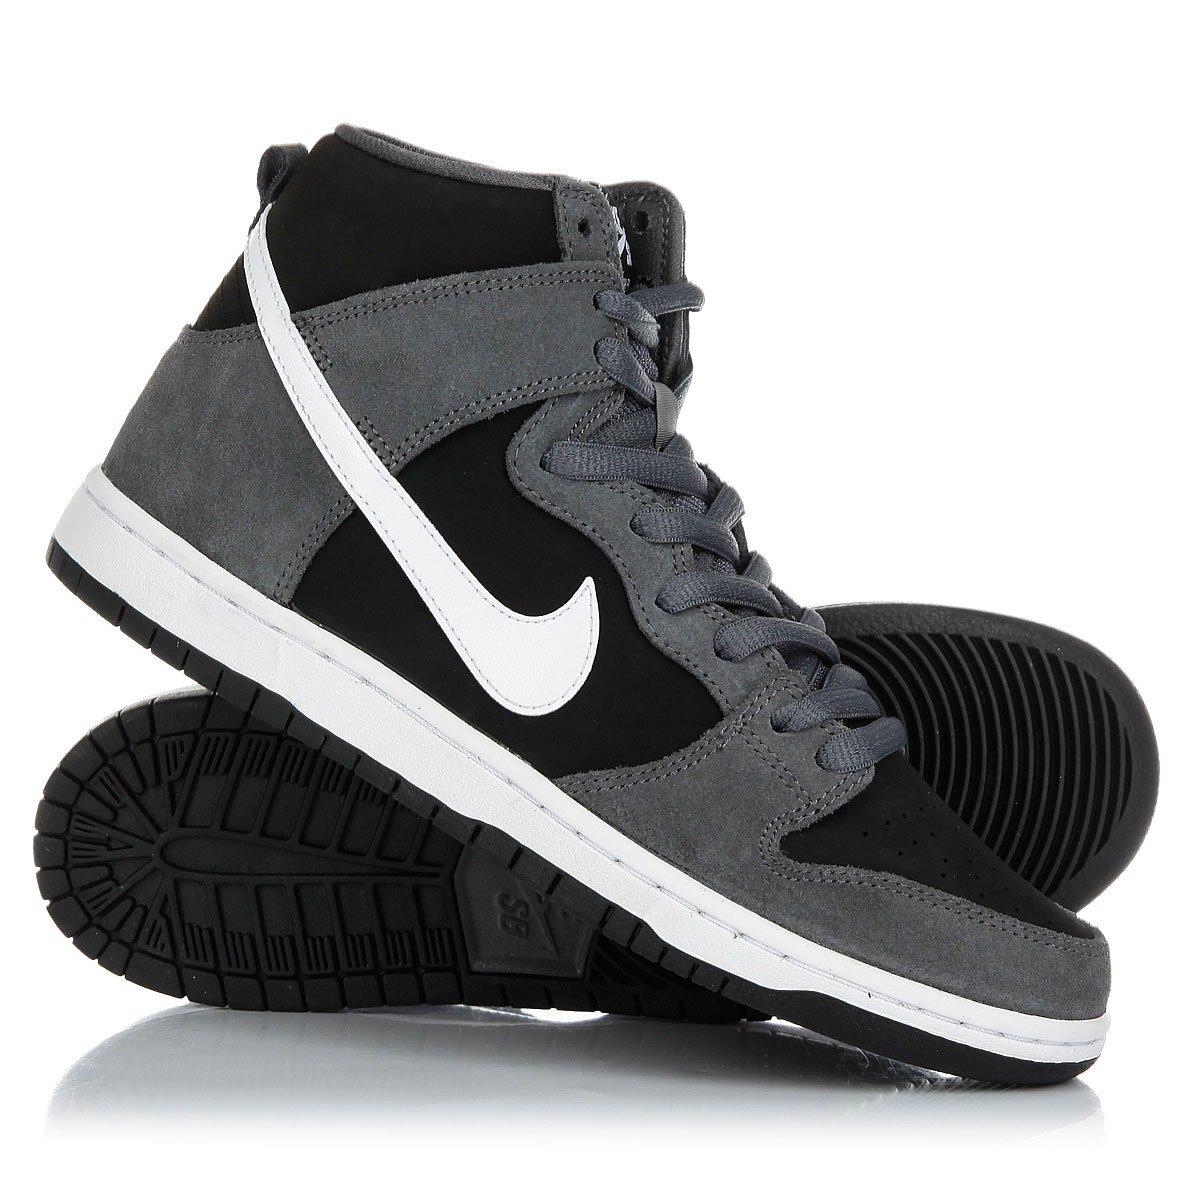 ad0a0c0e Купить кеды высокие Nike Sb Zoom Dunk High Pro Dark Grey/White-Black ...